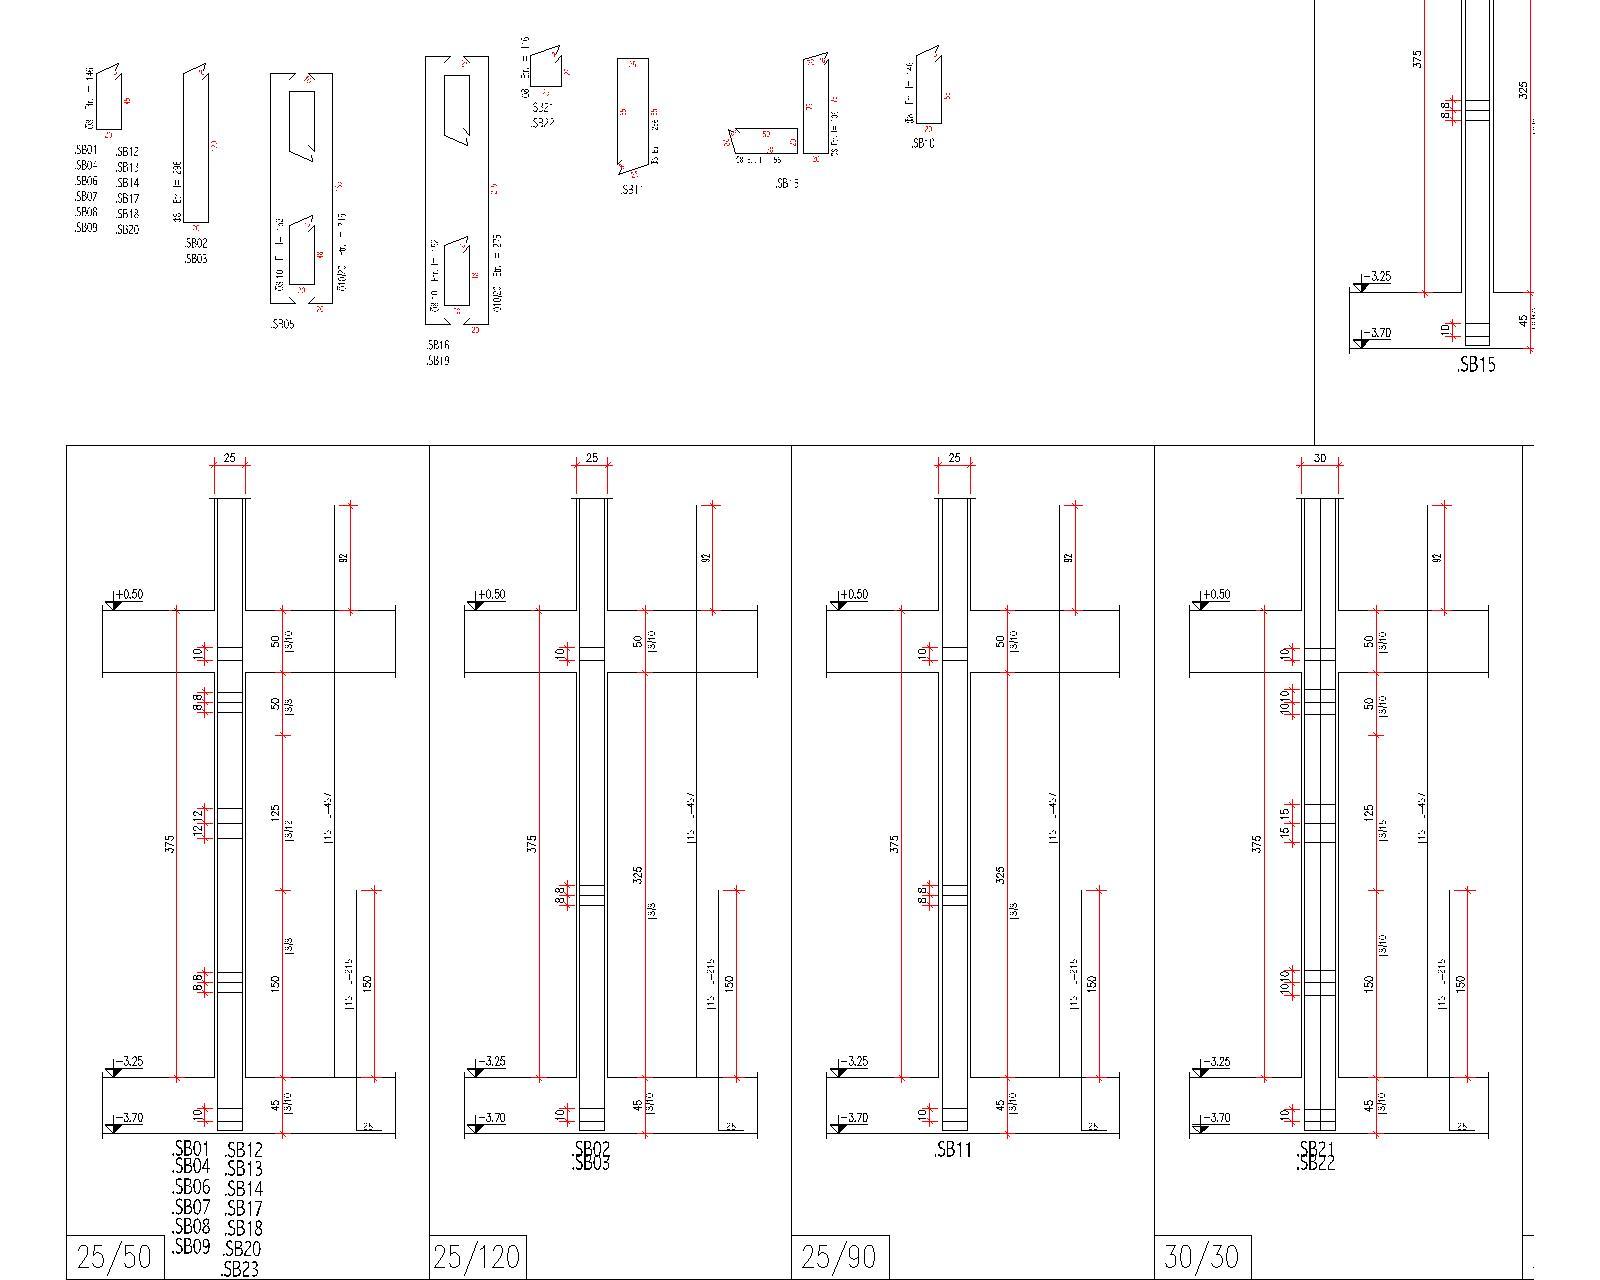 radye-temel-donati-filizleri-icin-kolon-detaylari